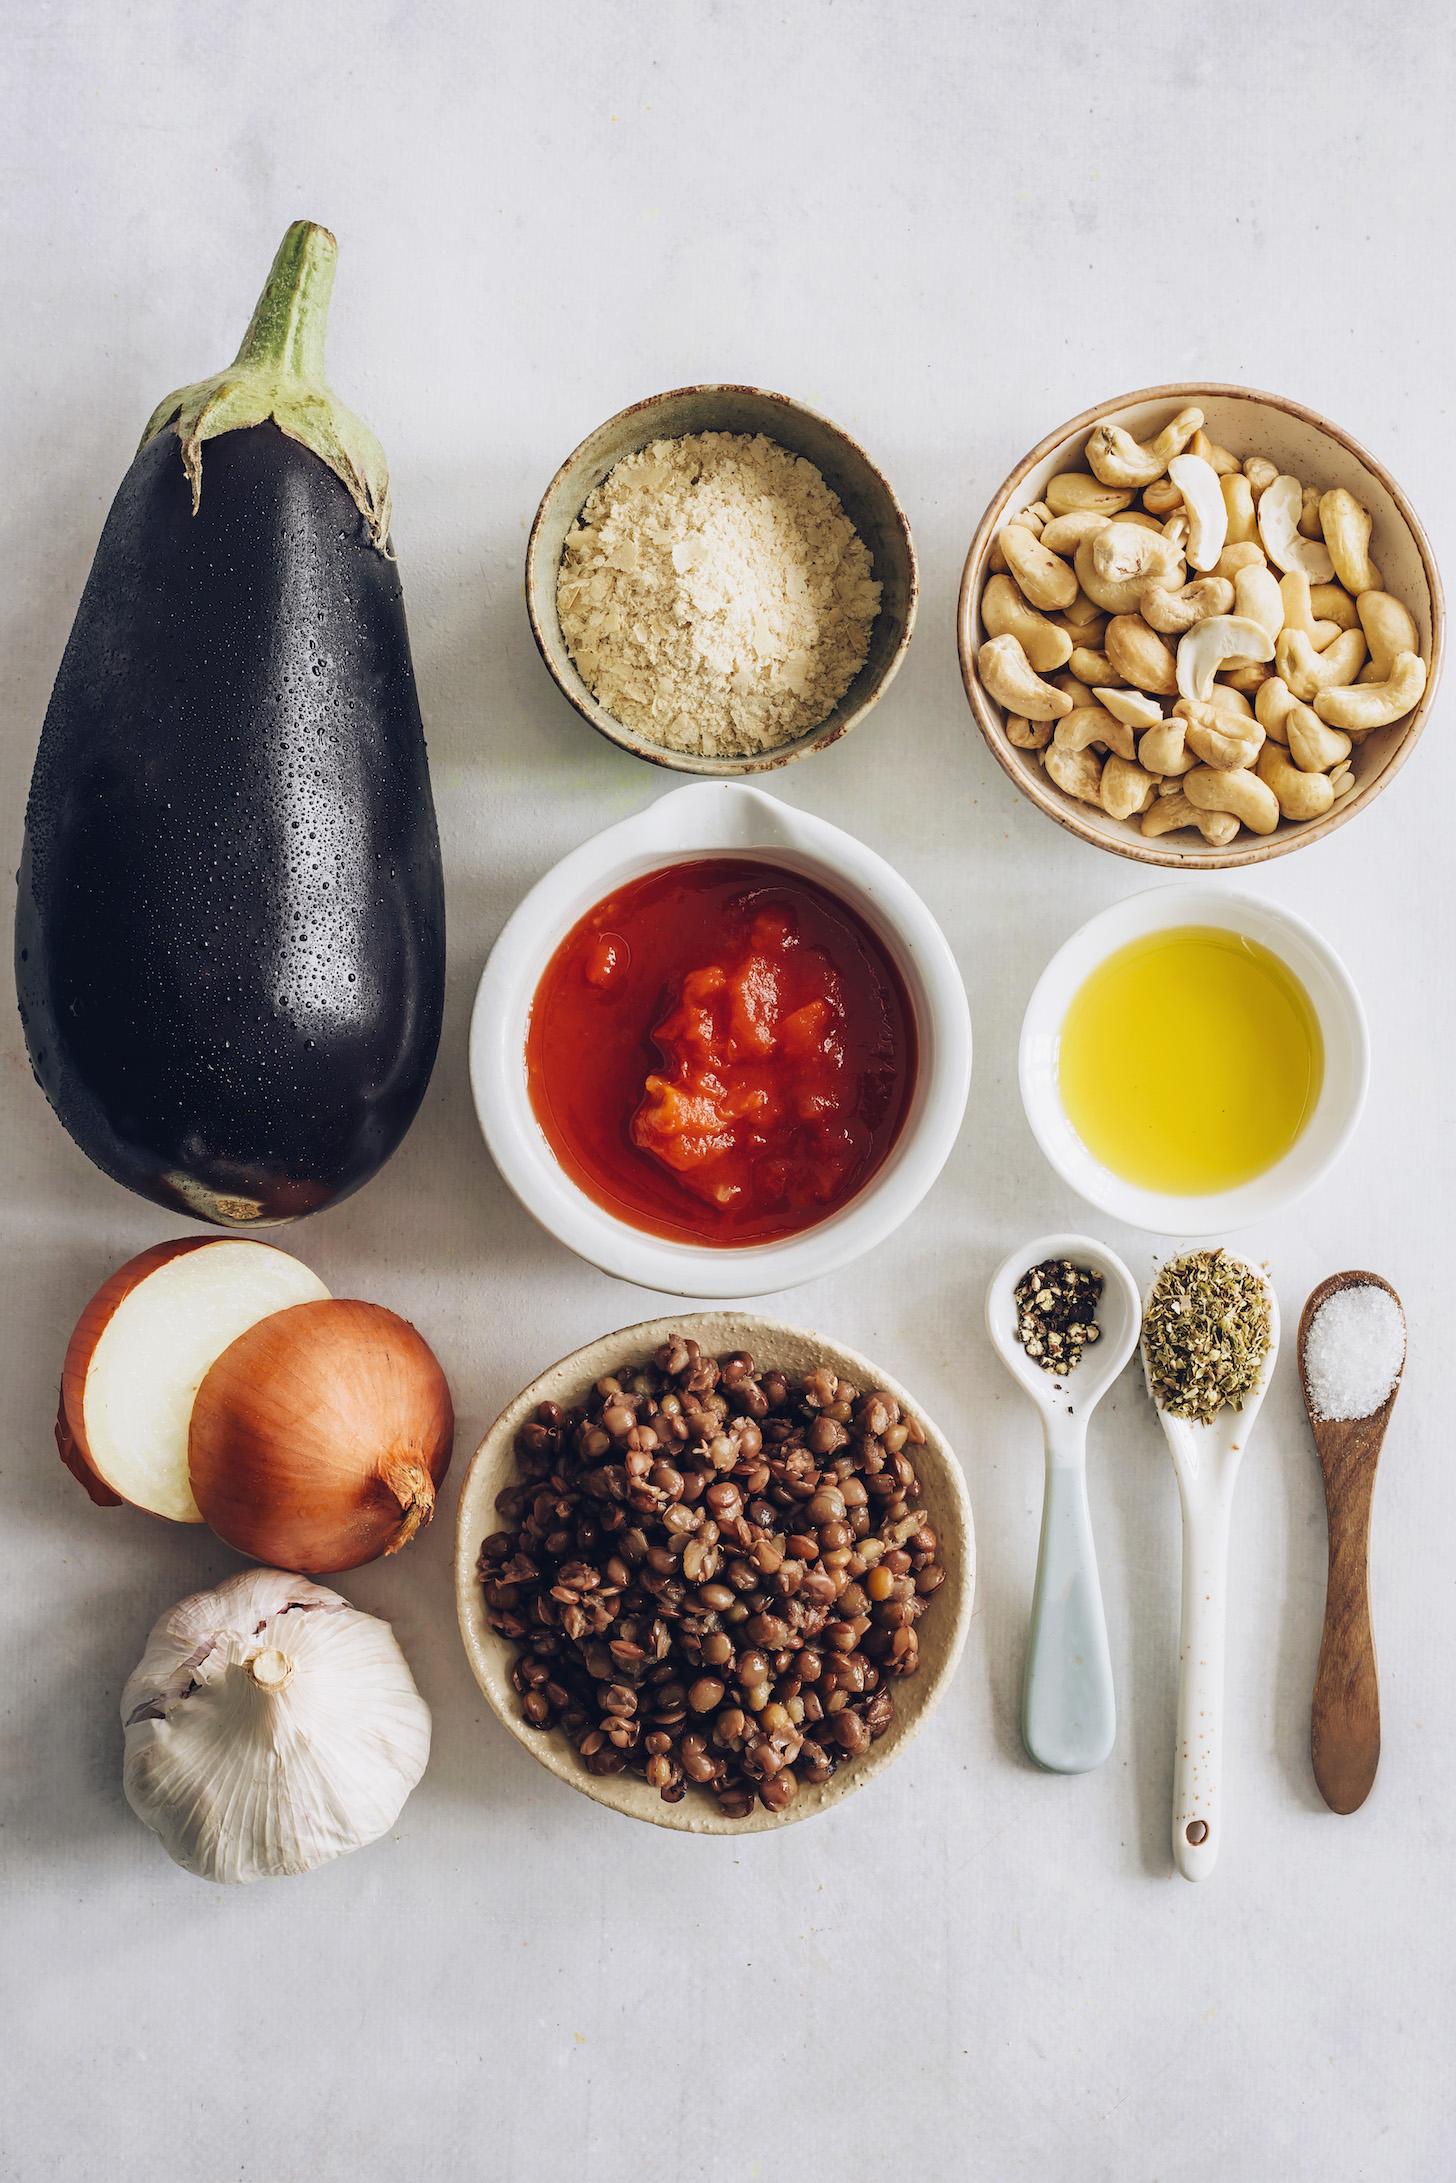 Eggplant, lentils, nutritional yeast, cashews, tomato, olive oil, onion, garlic, black pepper, oregano, and sea salt